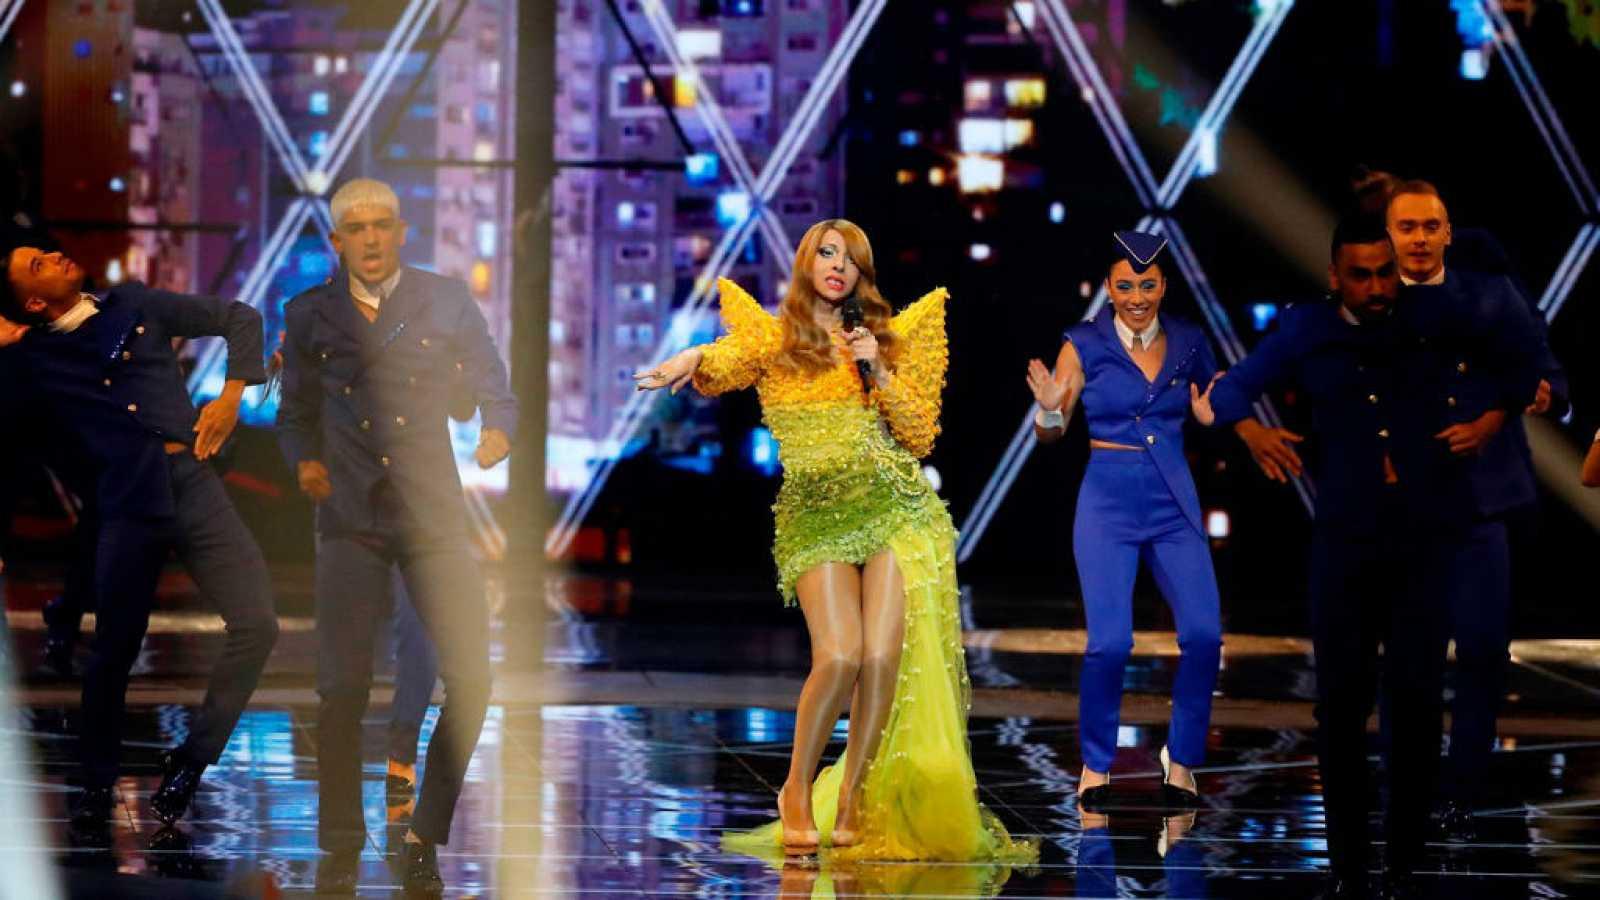 Universo - Eurovisión - Comienza el Festival de Eurovisión - 18/05/19 - Escuchar ahora